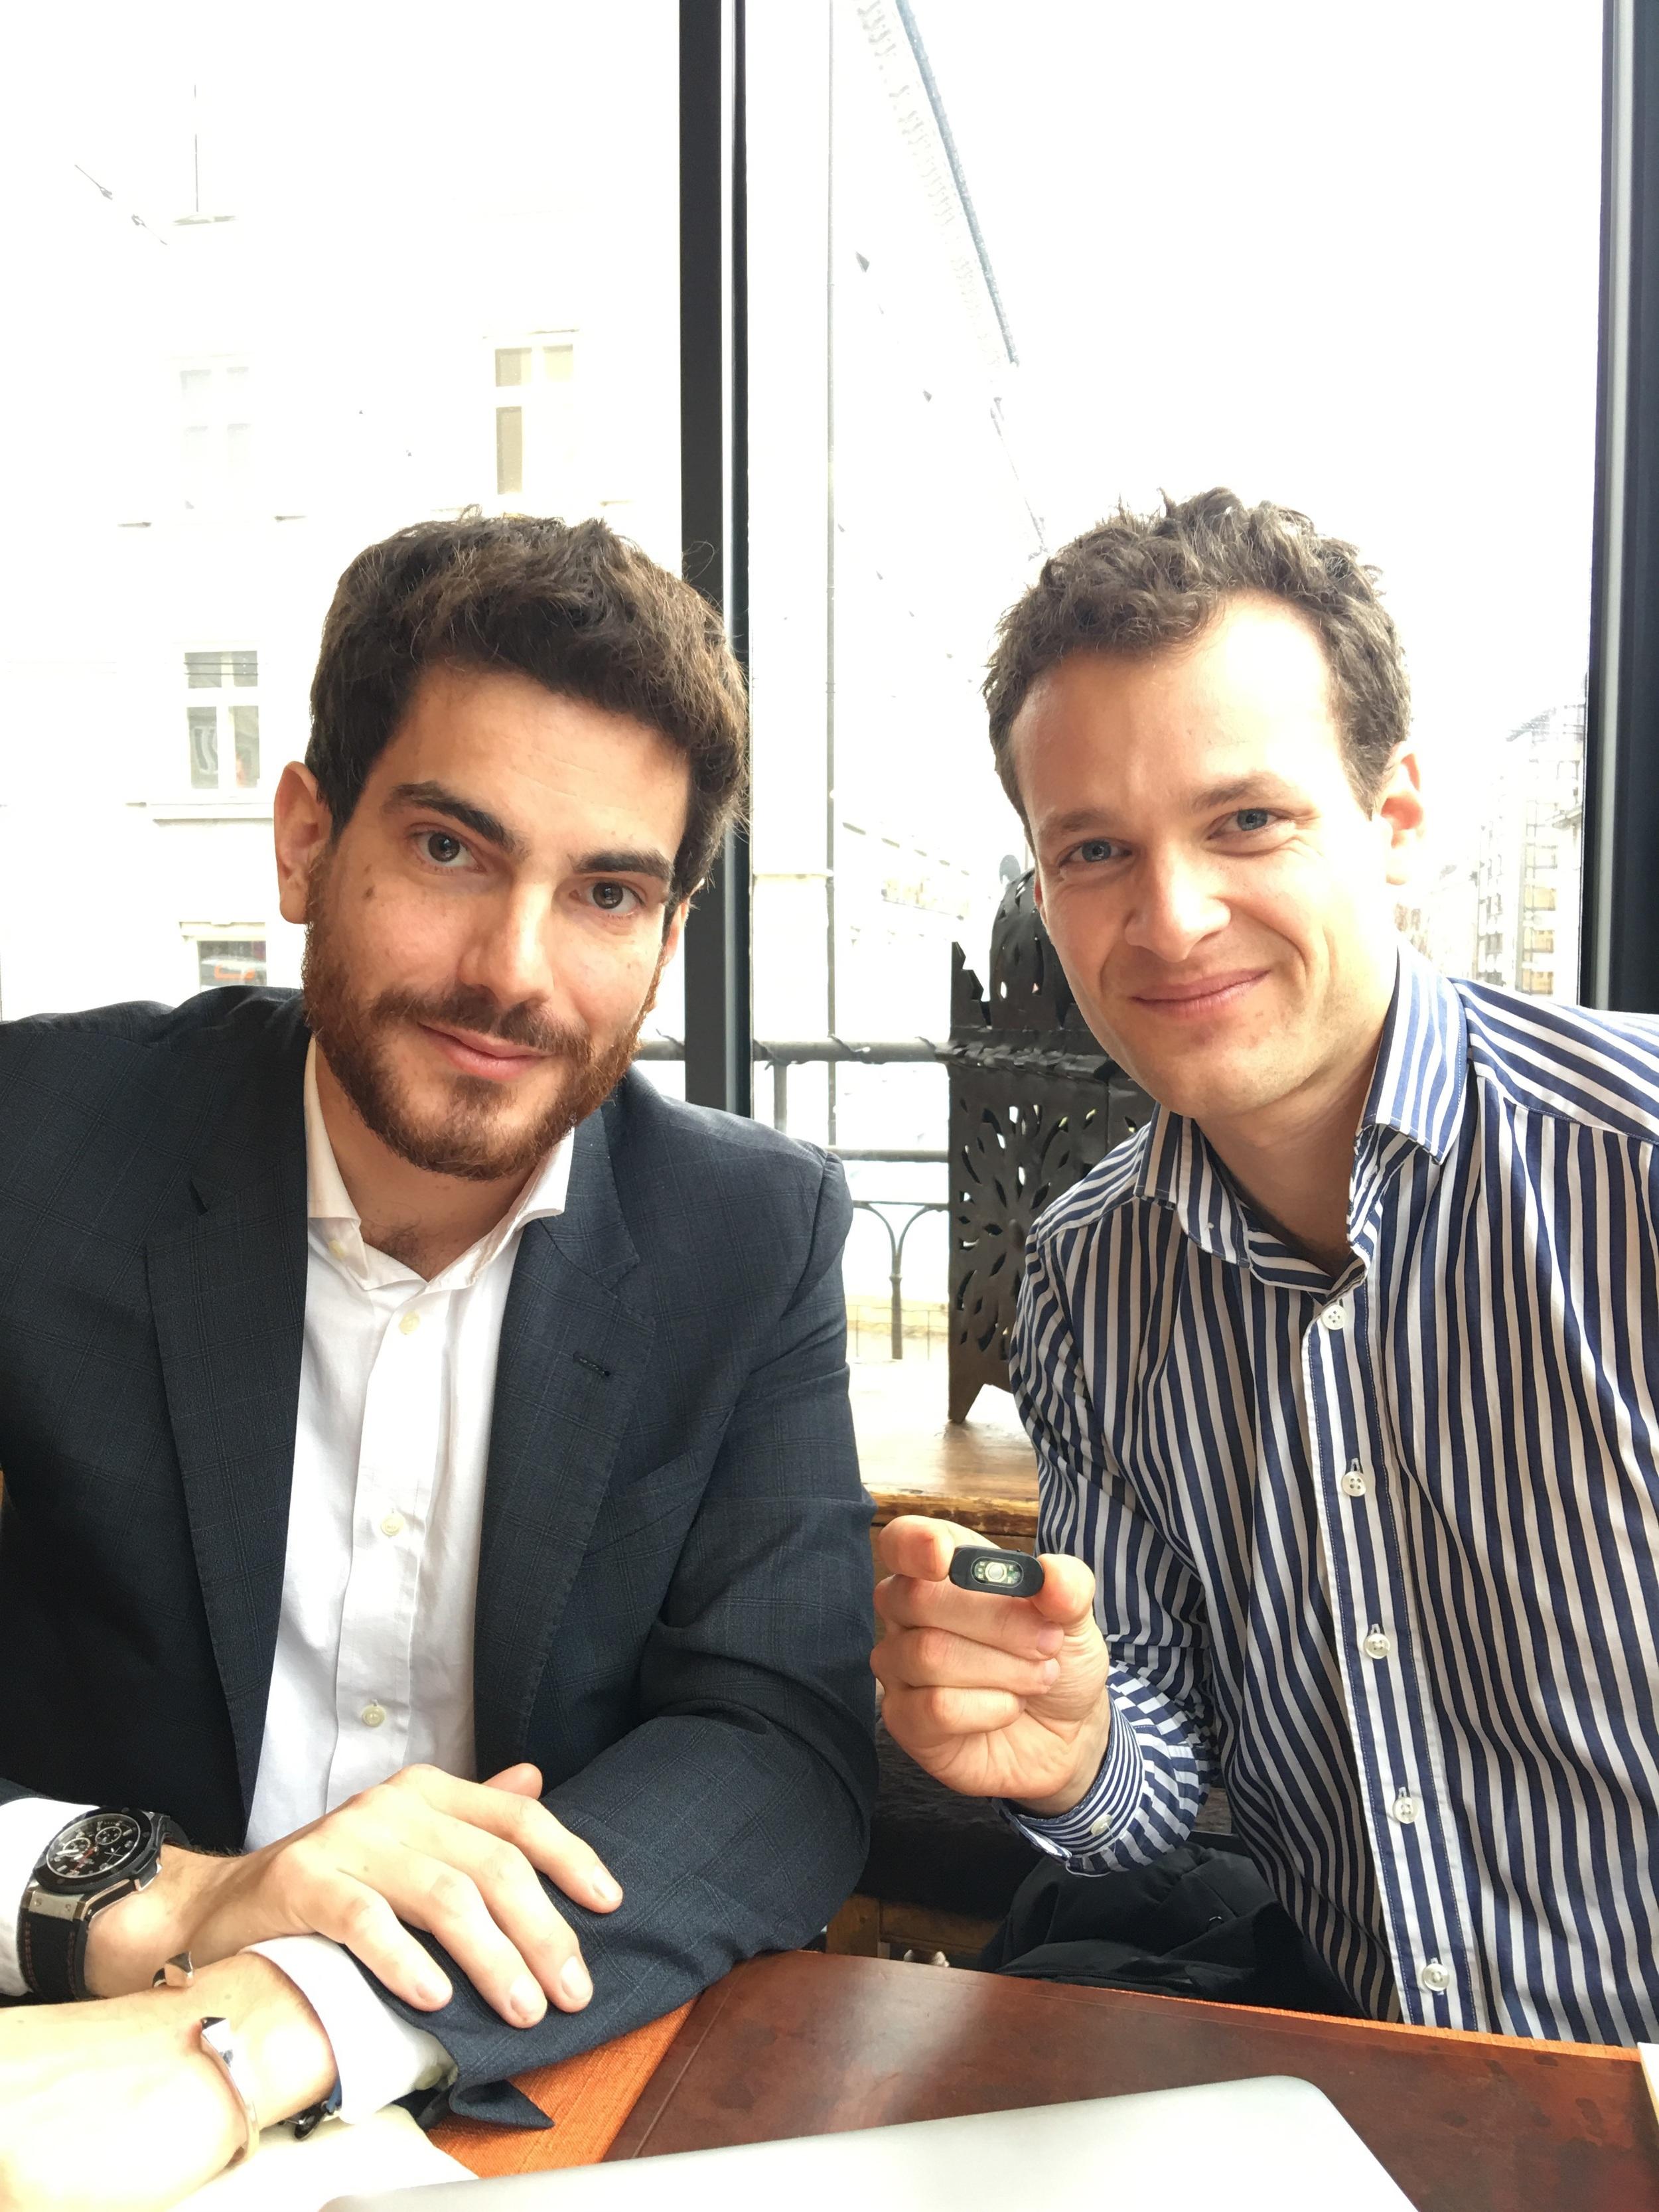 Biowatch: CFO Florent Bourachot (l.), CEO und Co-Founder Matthias Vanoni (r.) mit dem Prototyp des Biowatch-Sensors.